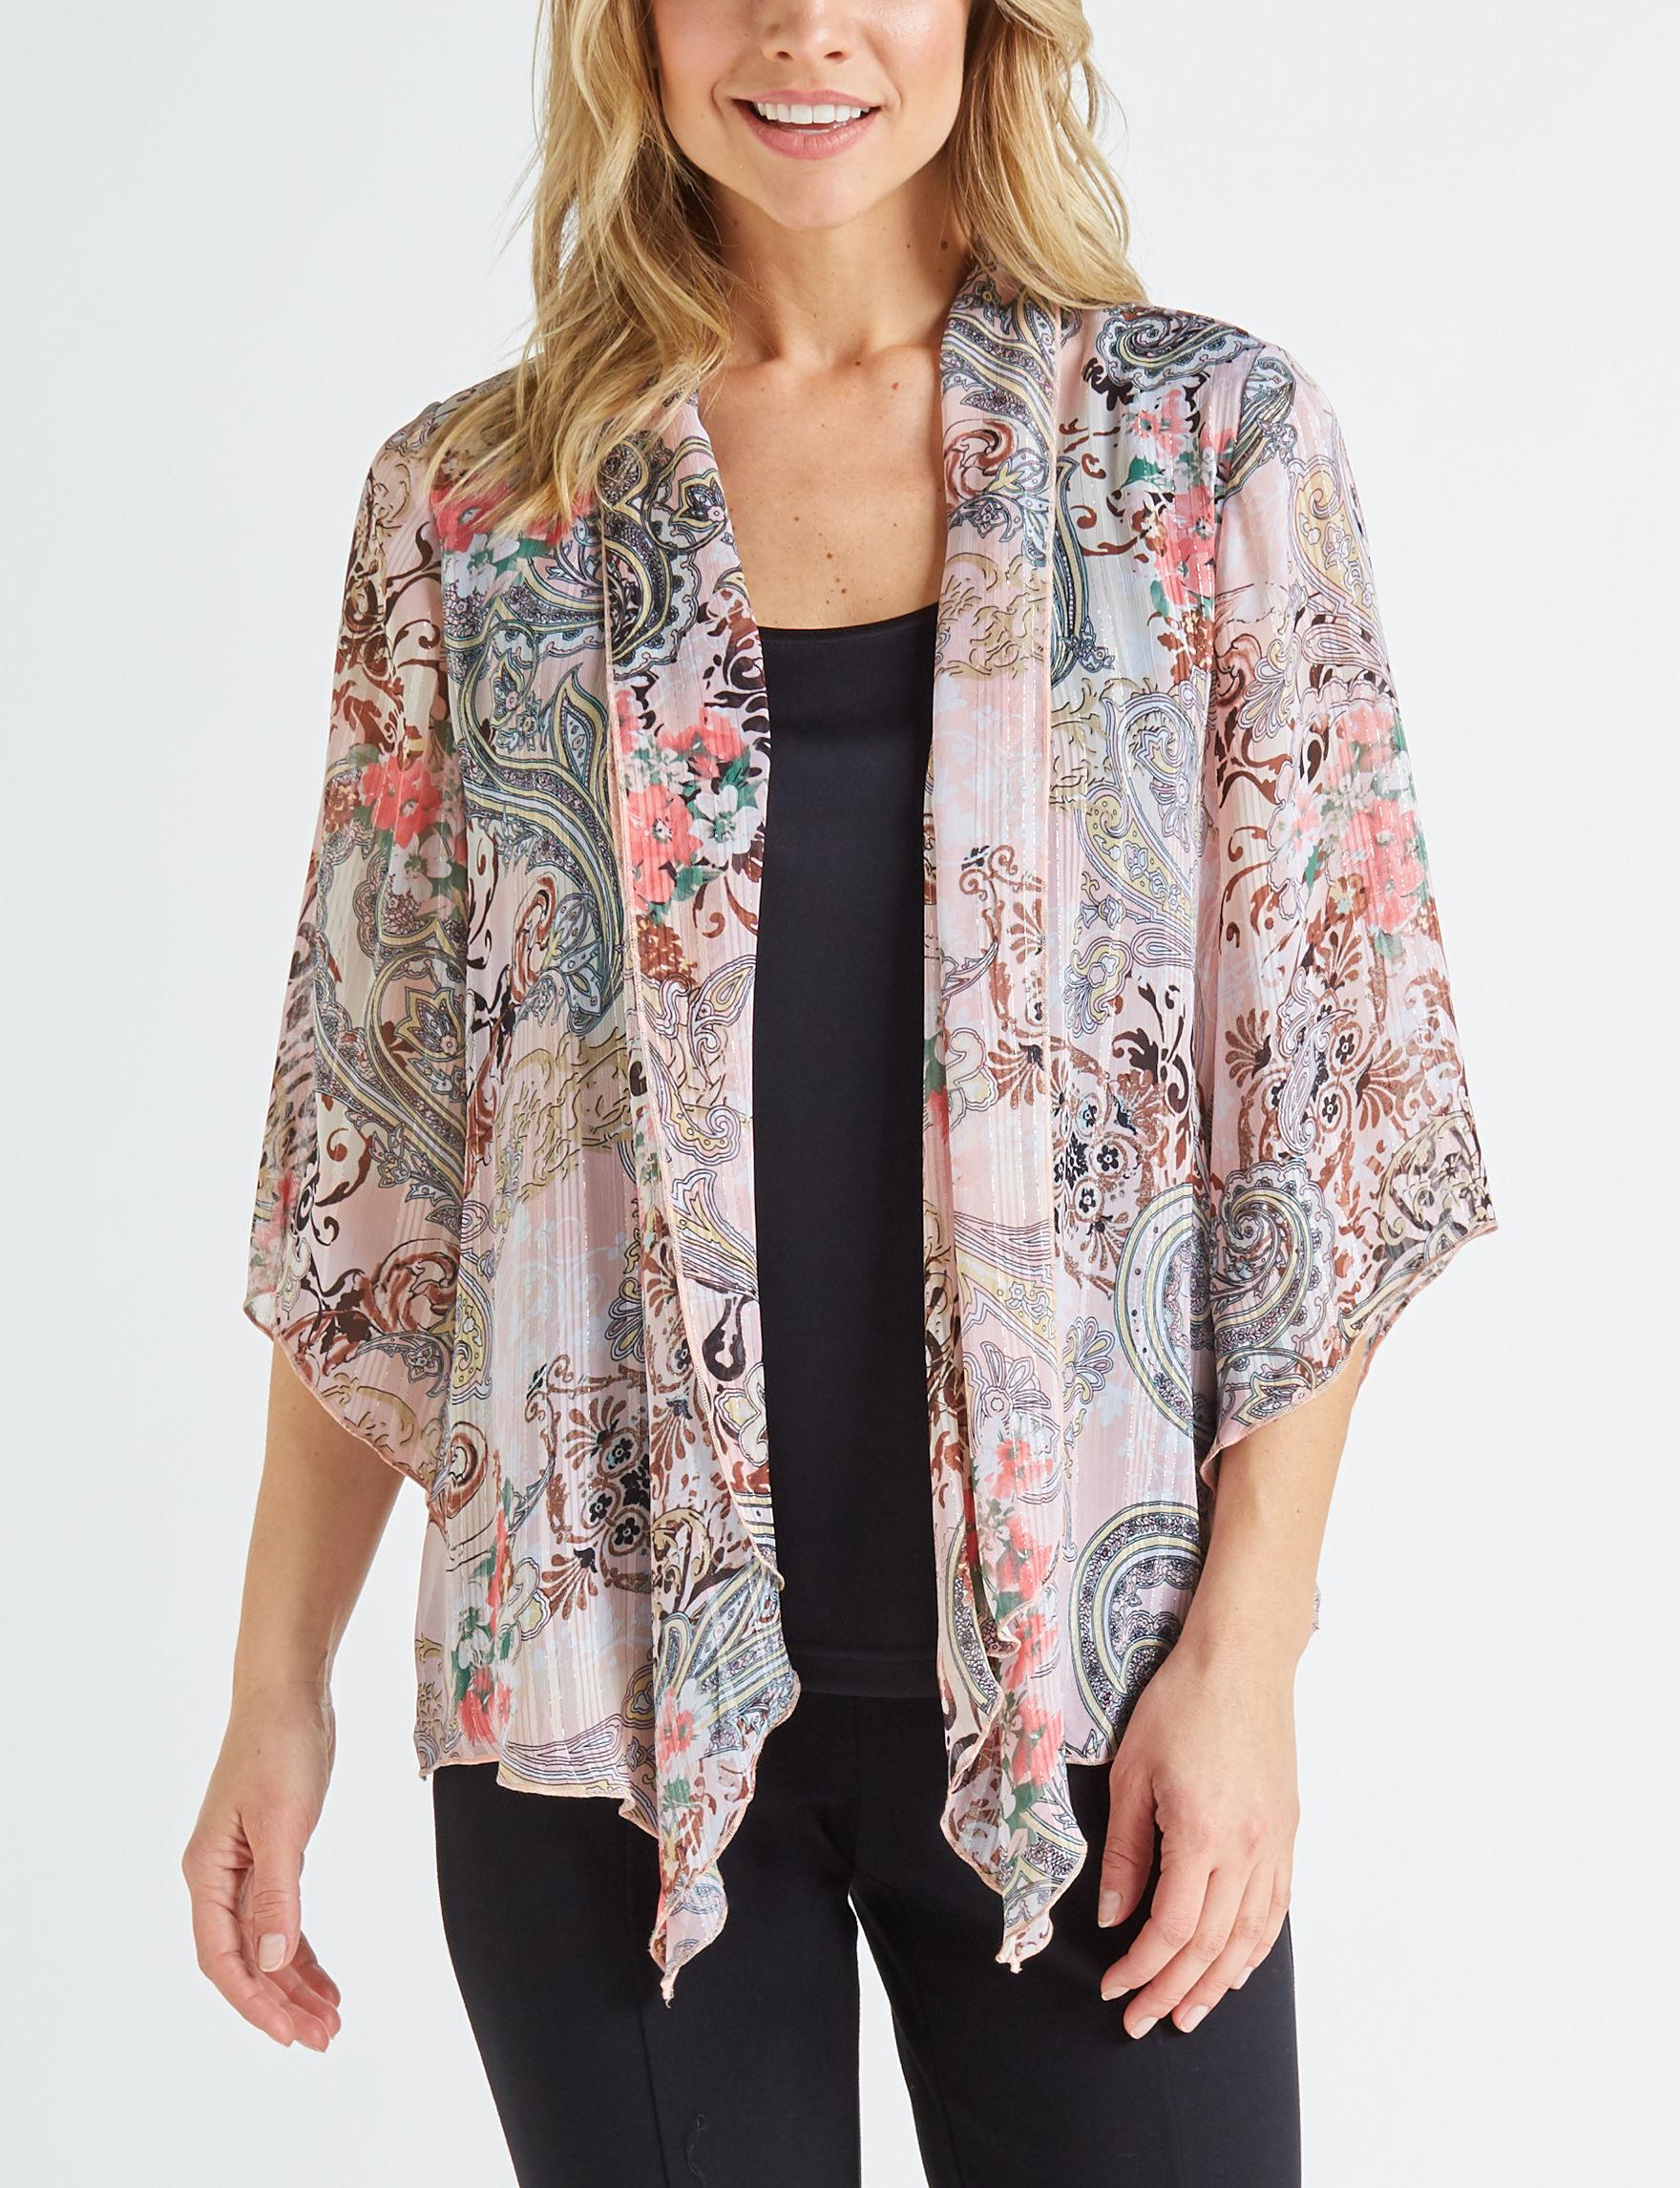 Sara Michelle Pink / Black Shirts & Blouses